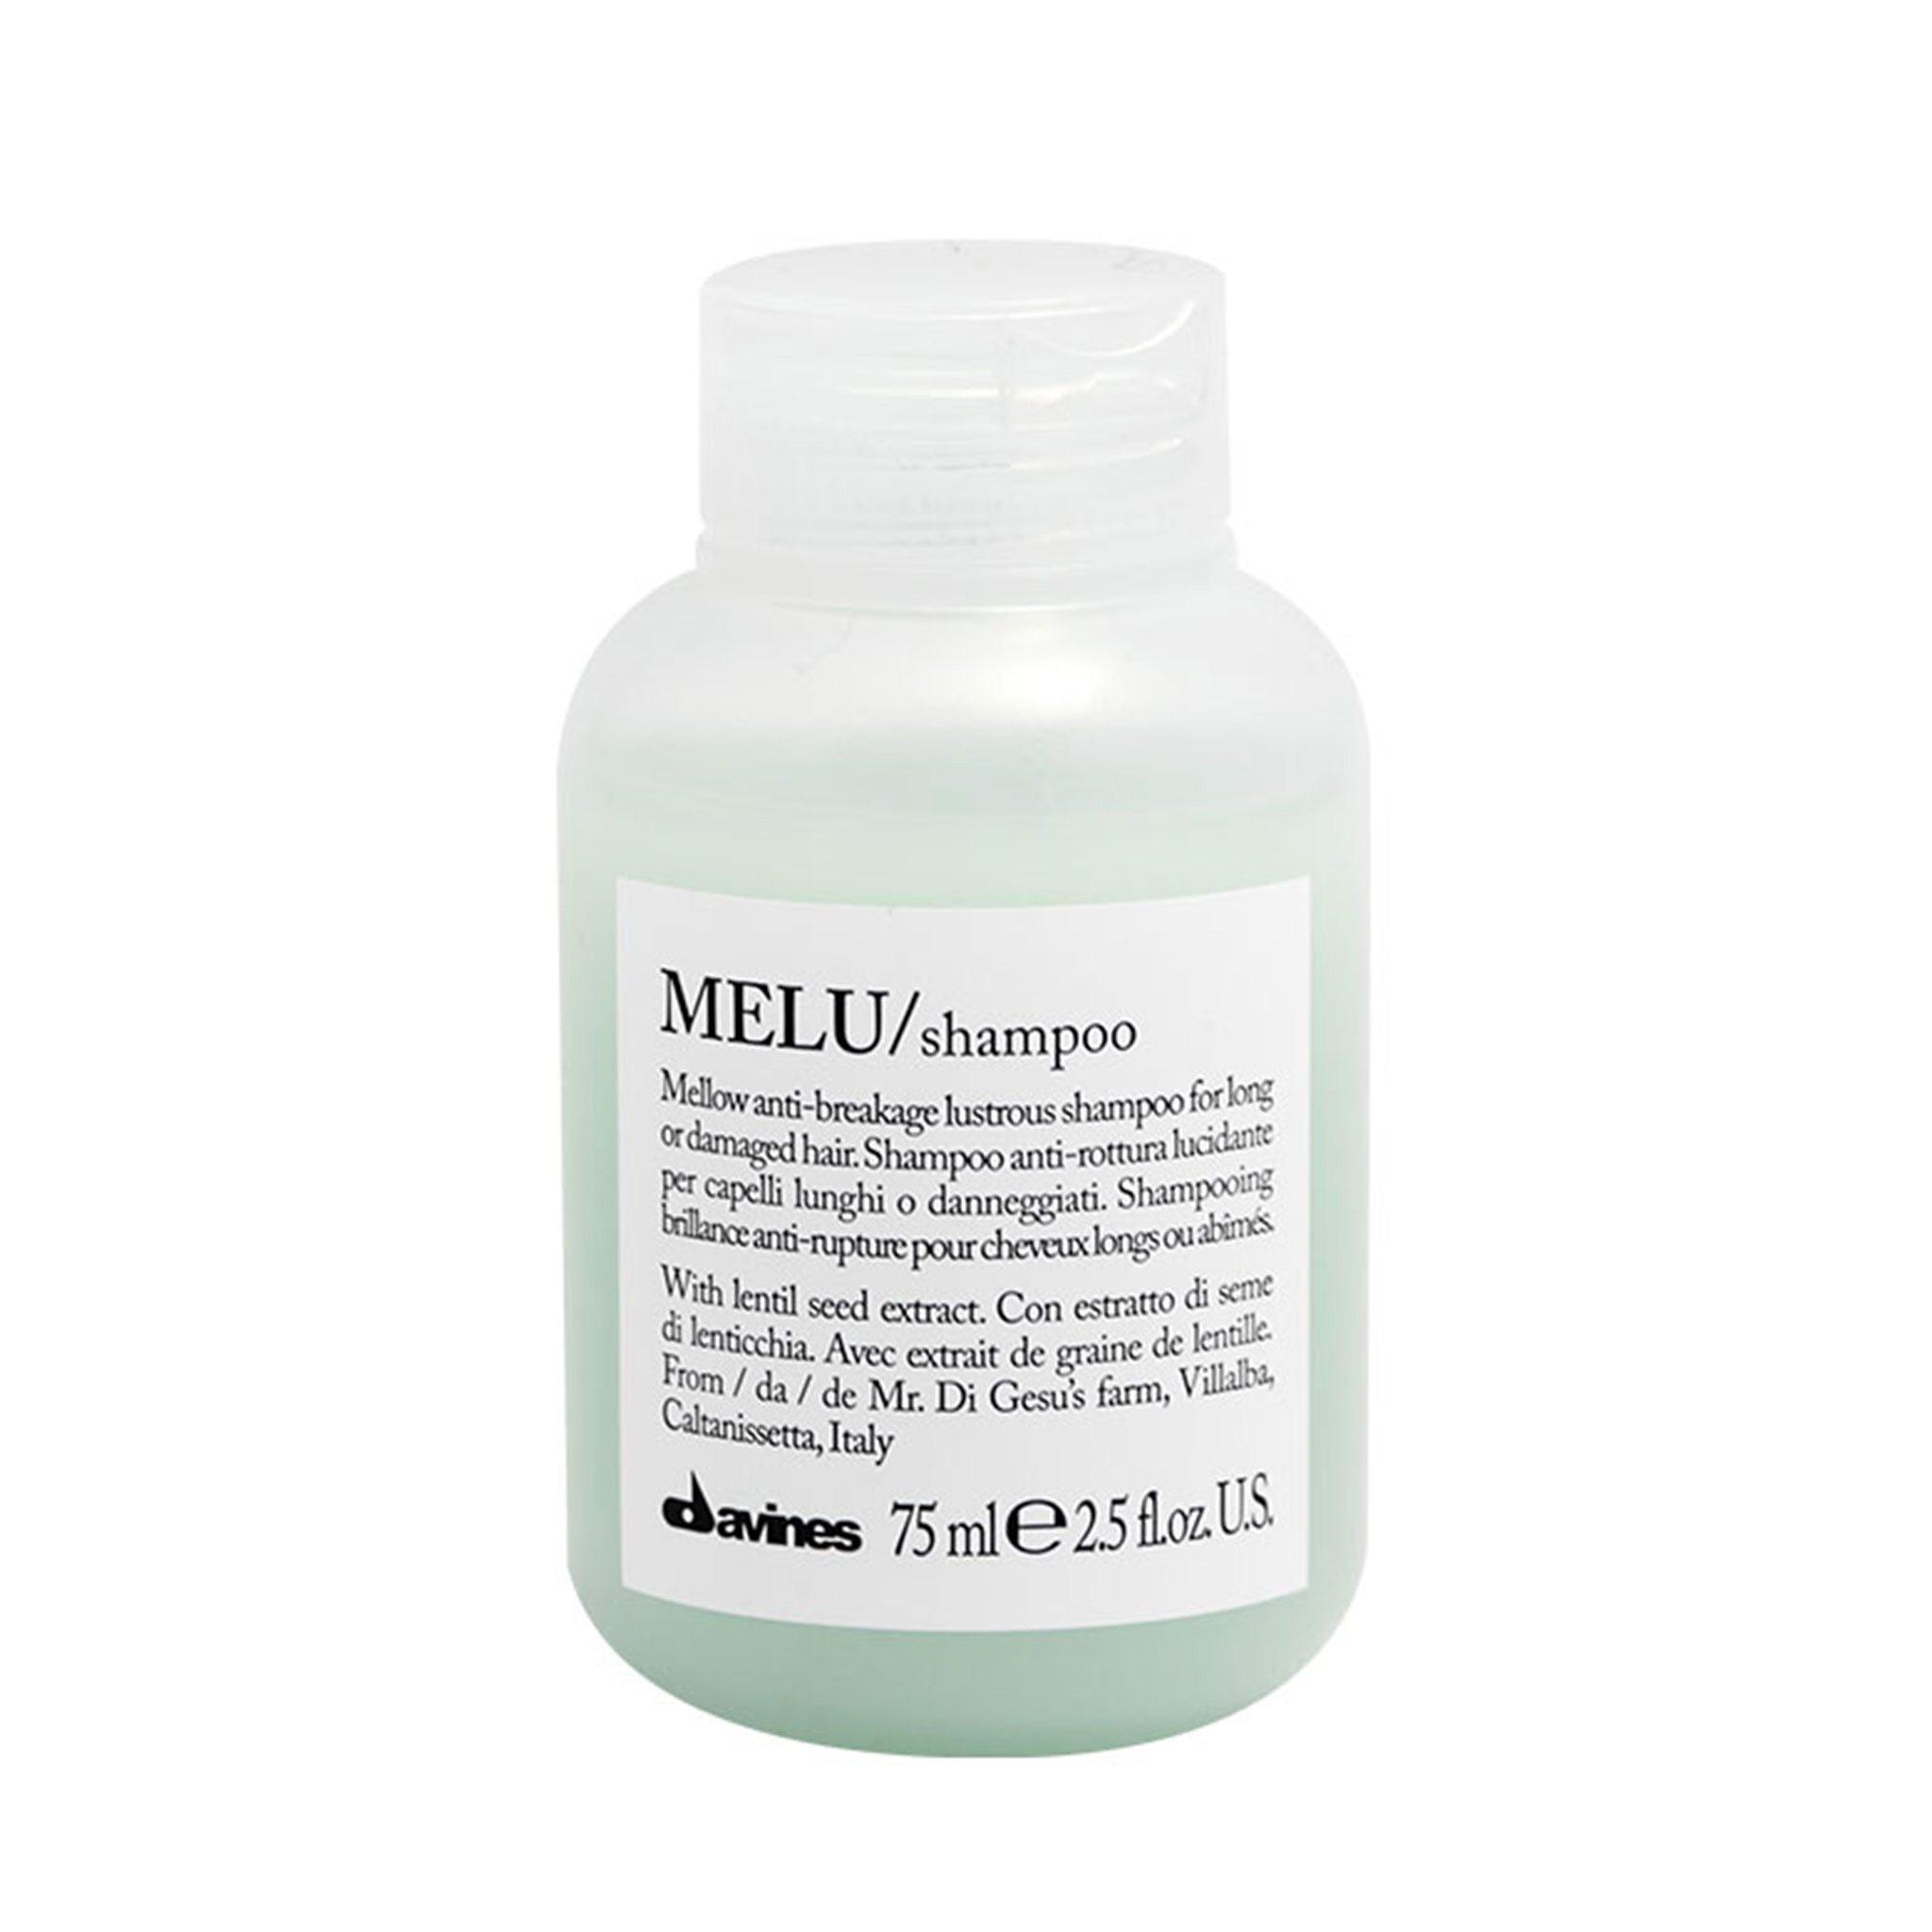 DAVINES MELU/shampoo - Шампунь для предотвращения ломкости волос 75 мл